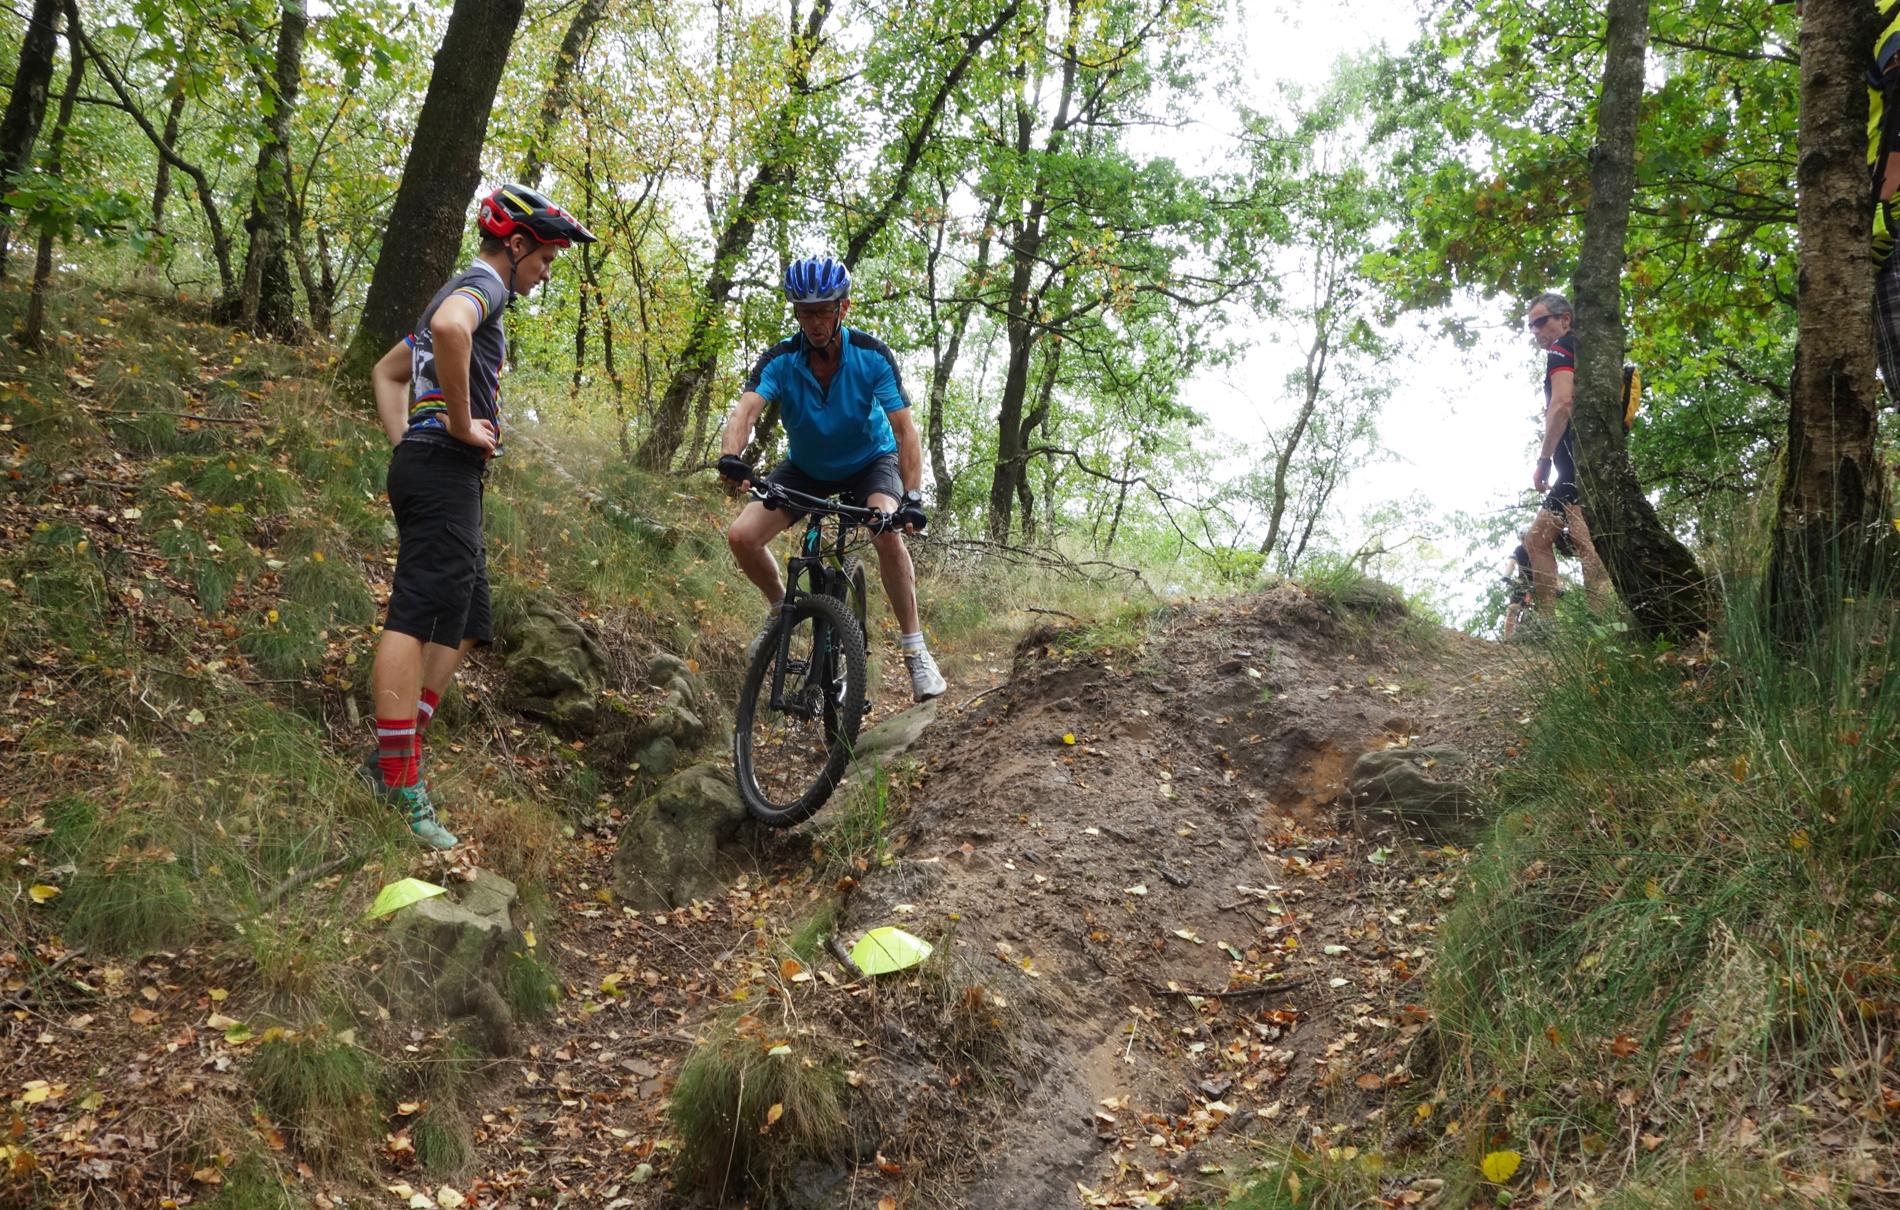 mountainbike-kurs-hattingen-bg2